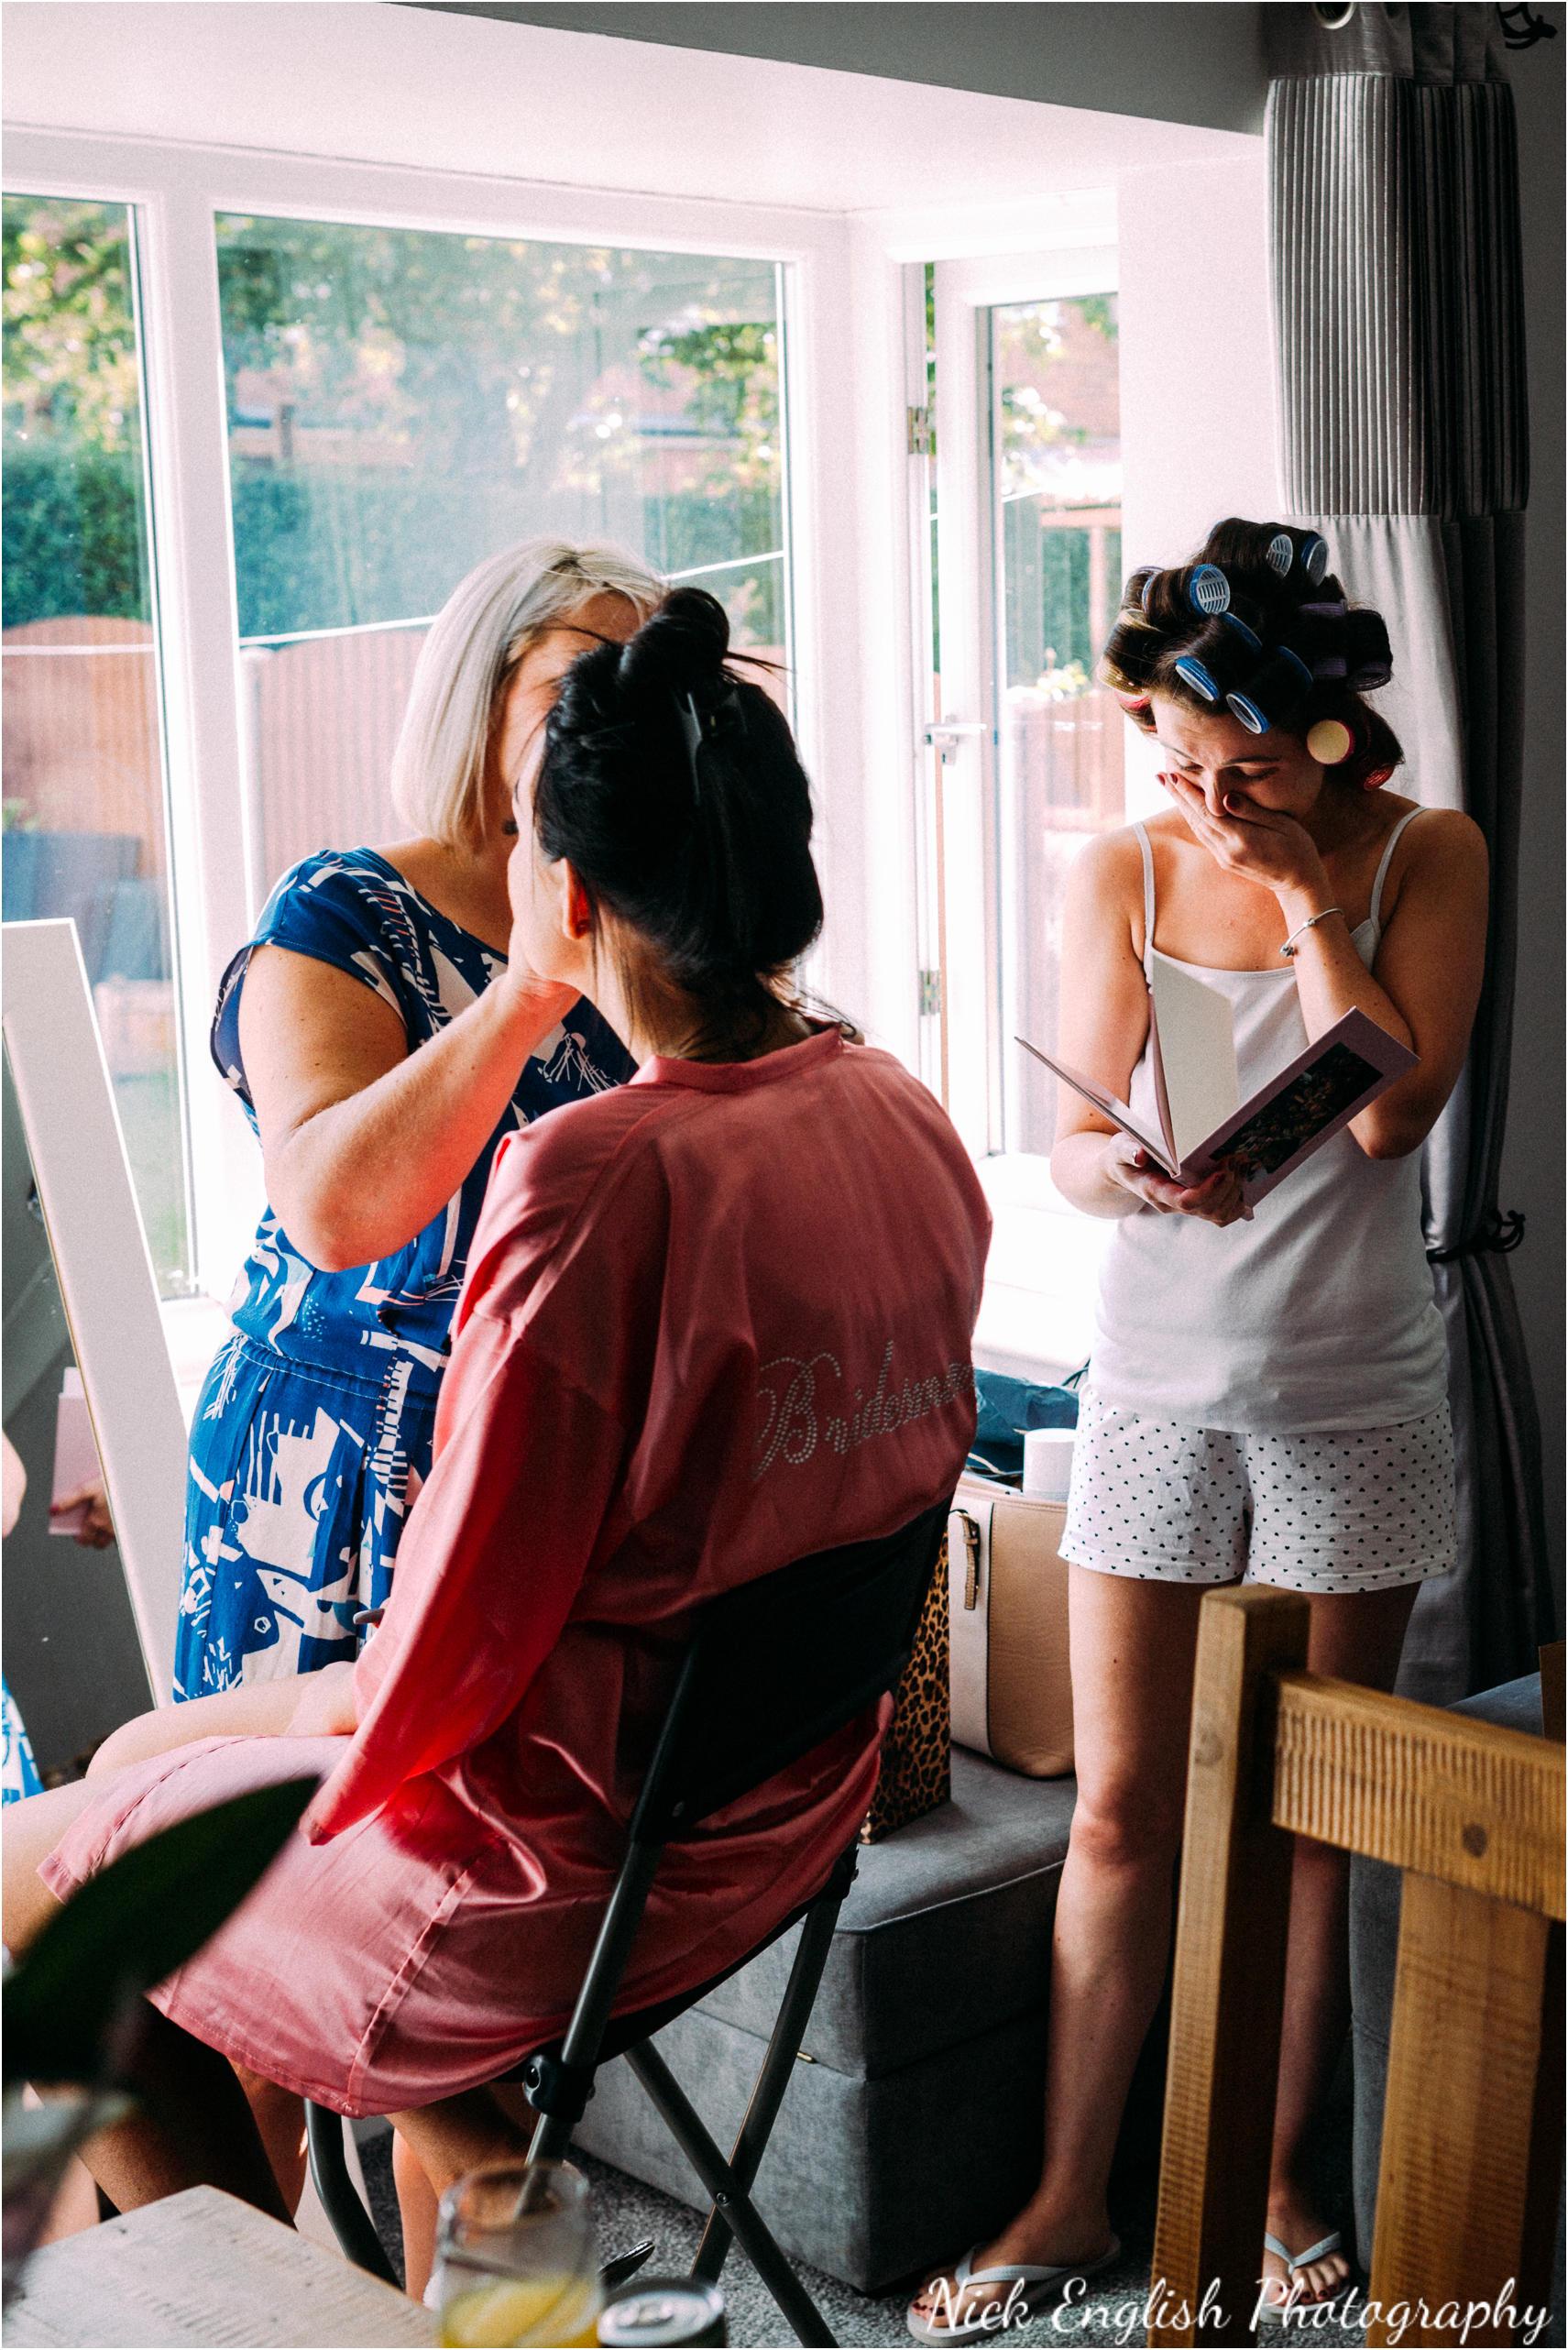 Stacey-Ash-Wedding-Photographs-Stanley-House-Preston-Lancashire-12.jpg